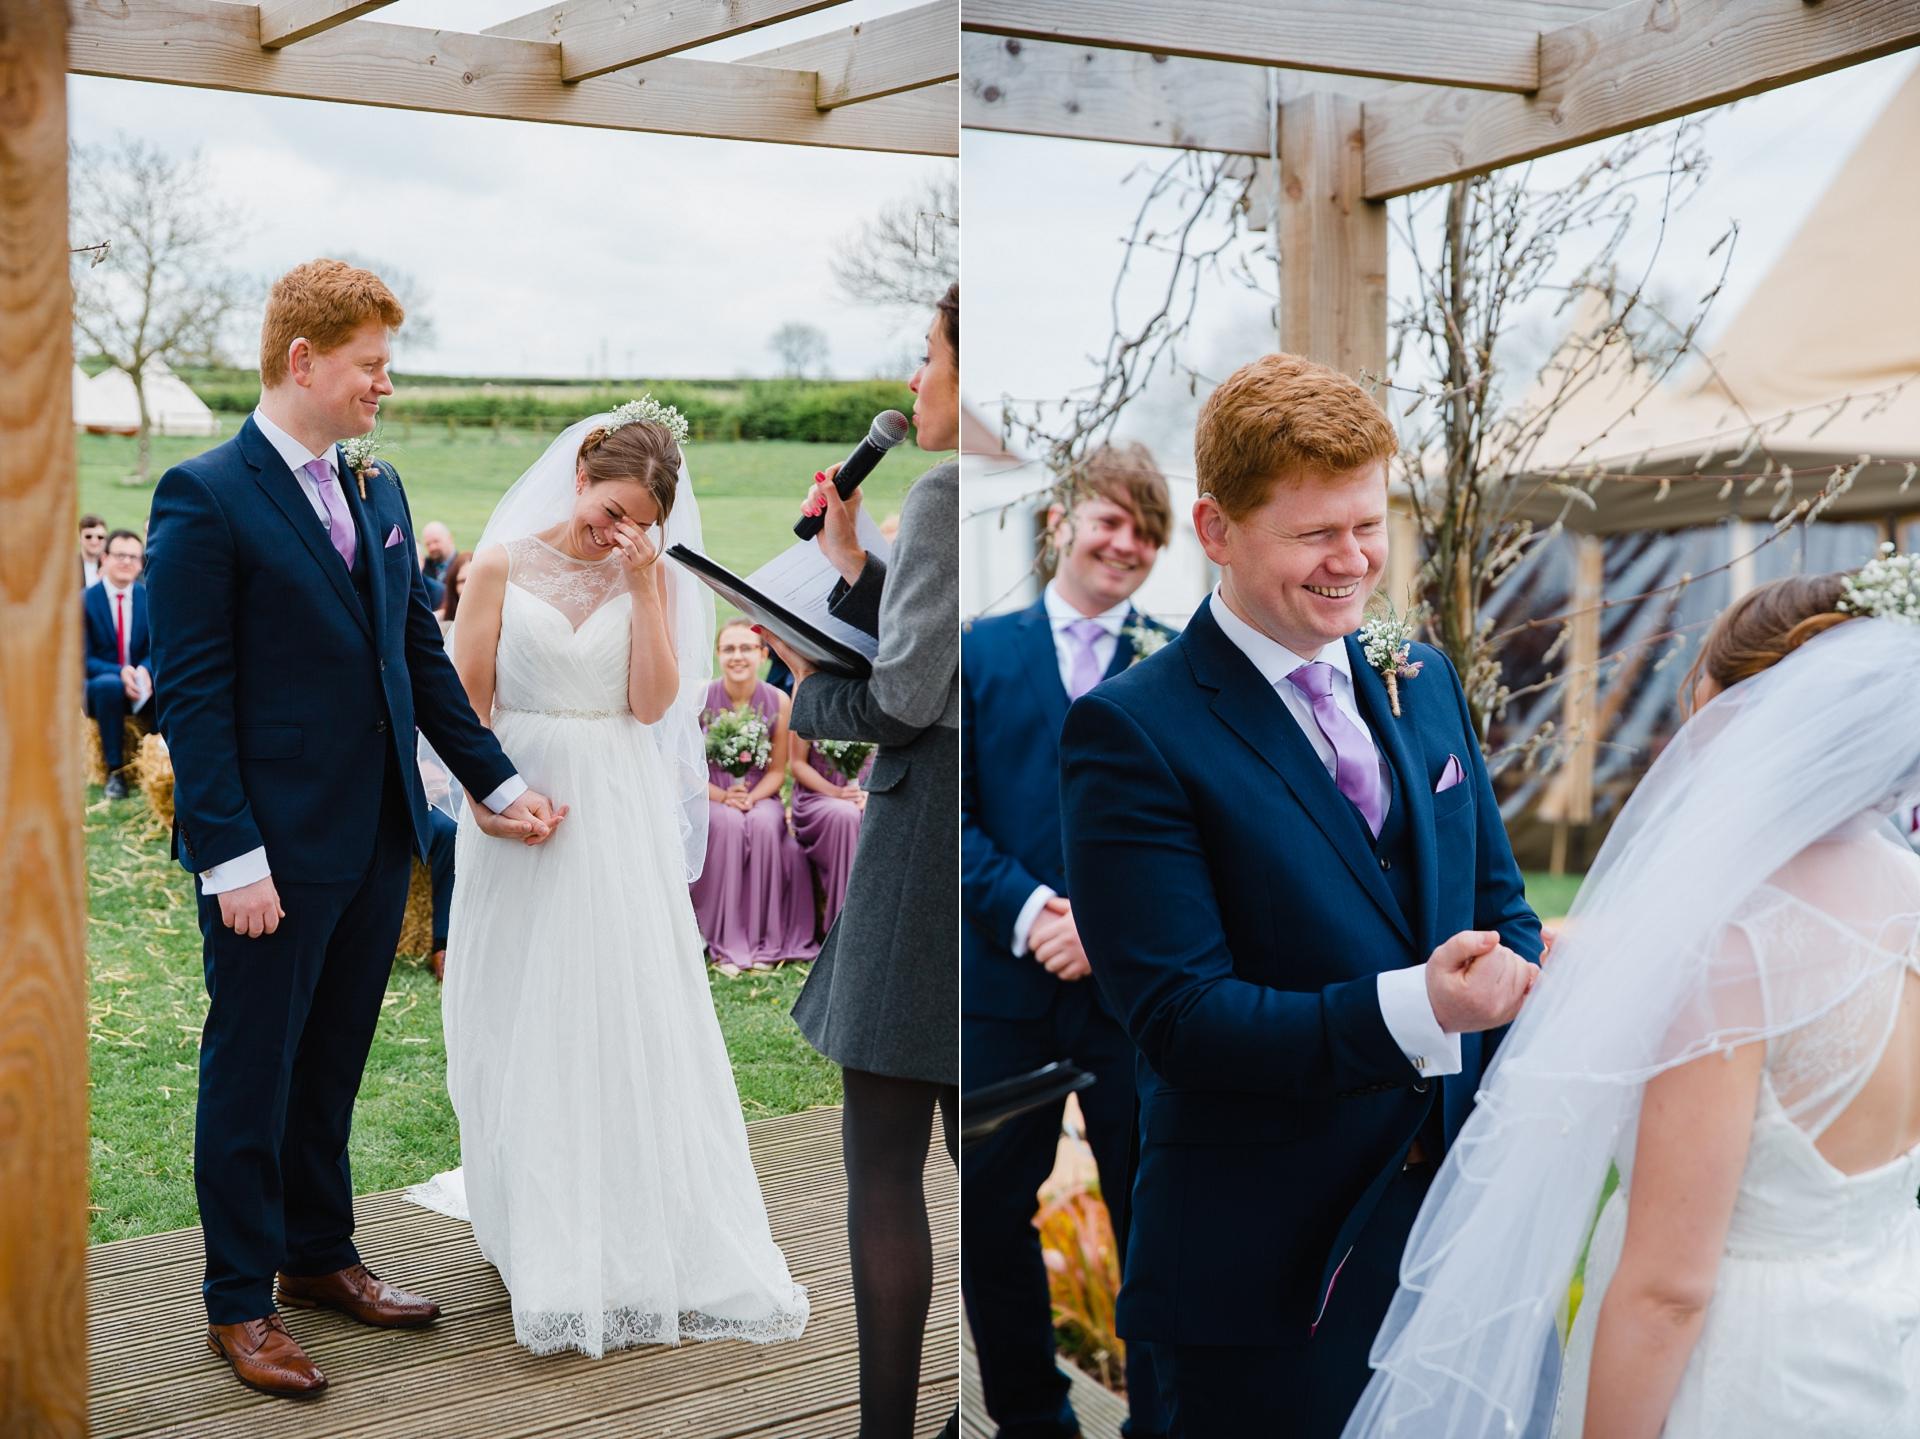 alternative outdoor wedding ceremony